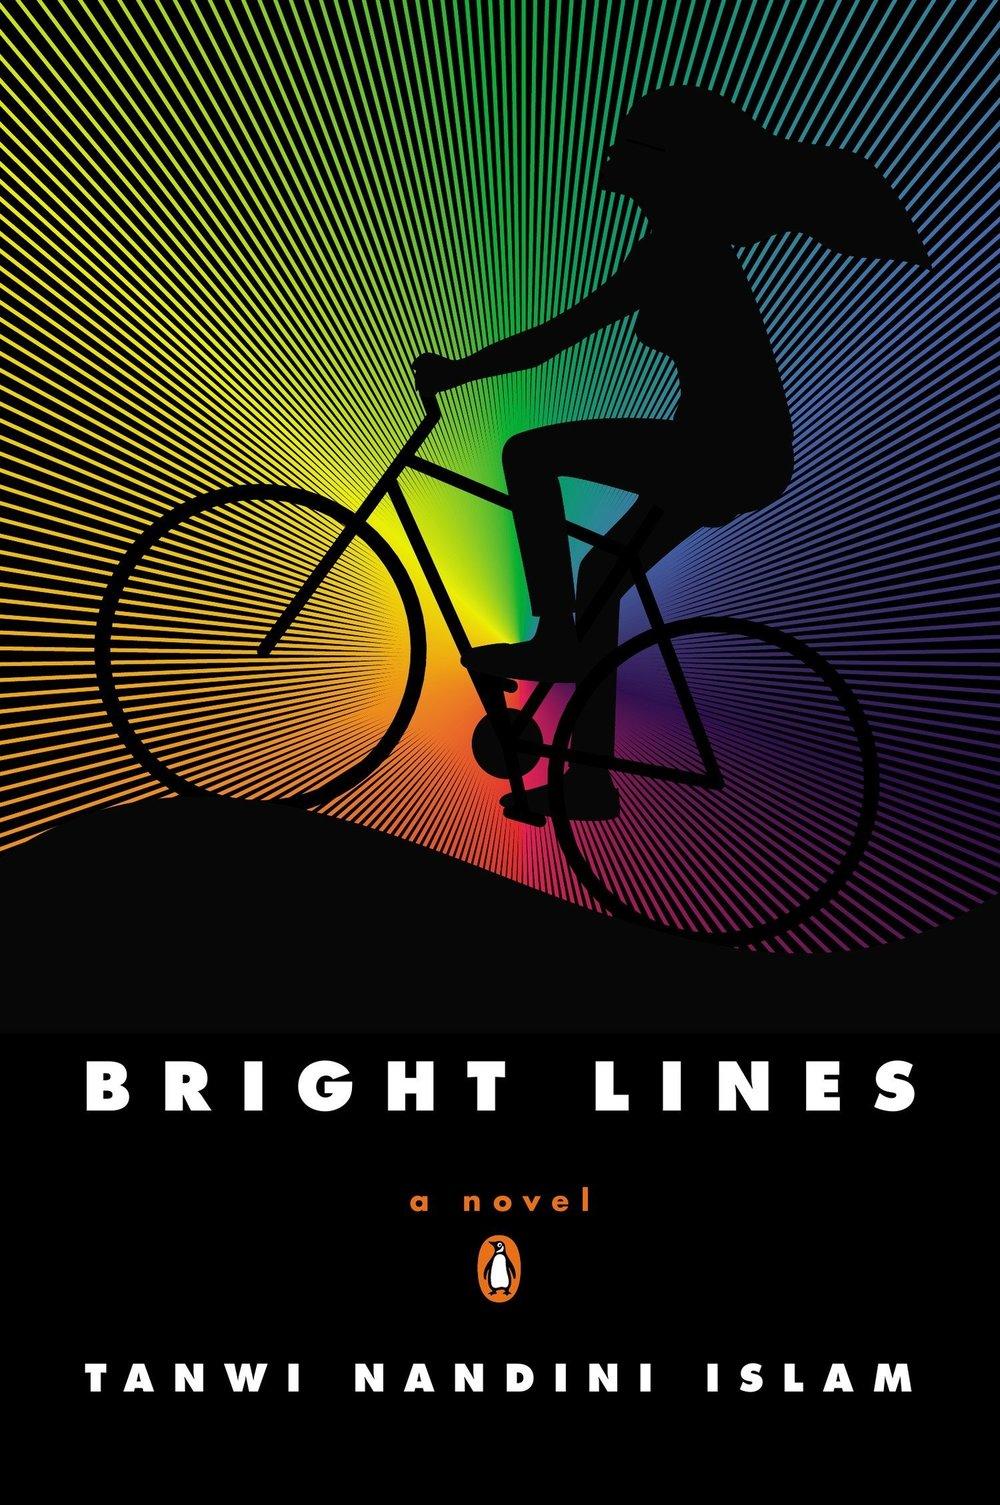 Bright-Lines-Tanwi-Nandini-Islam.jpg